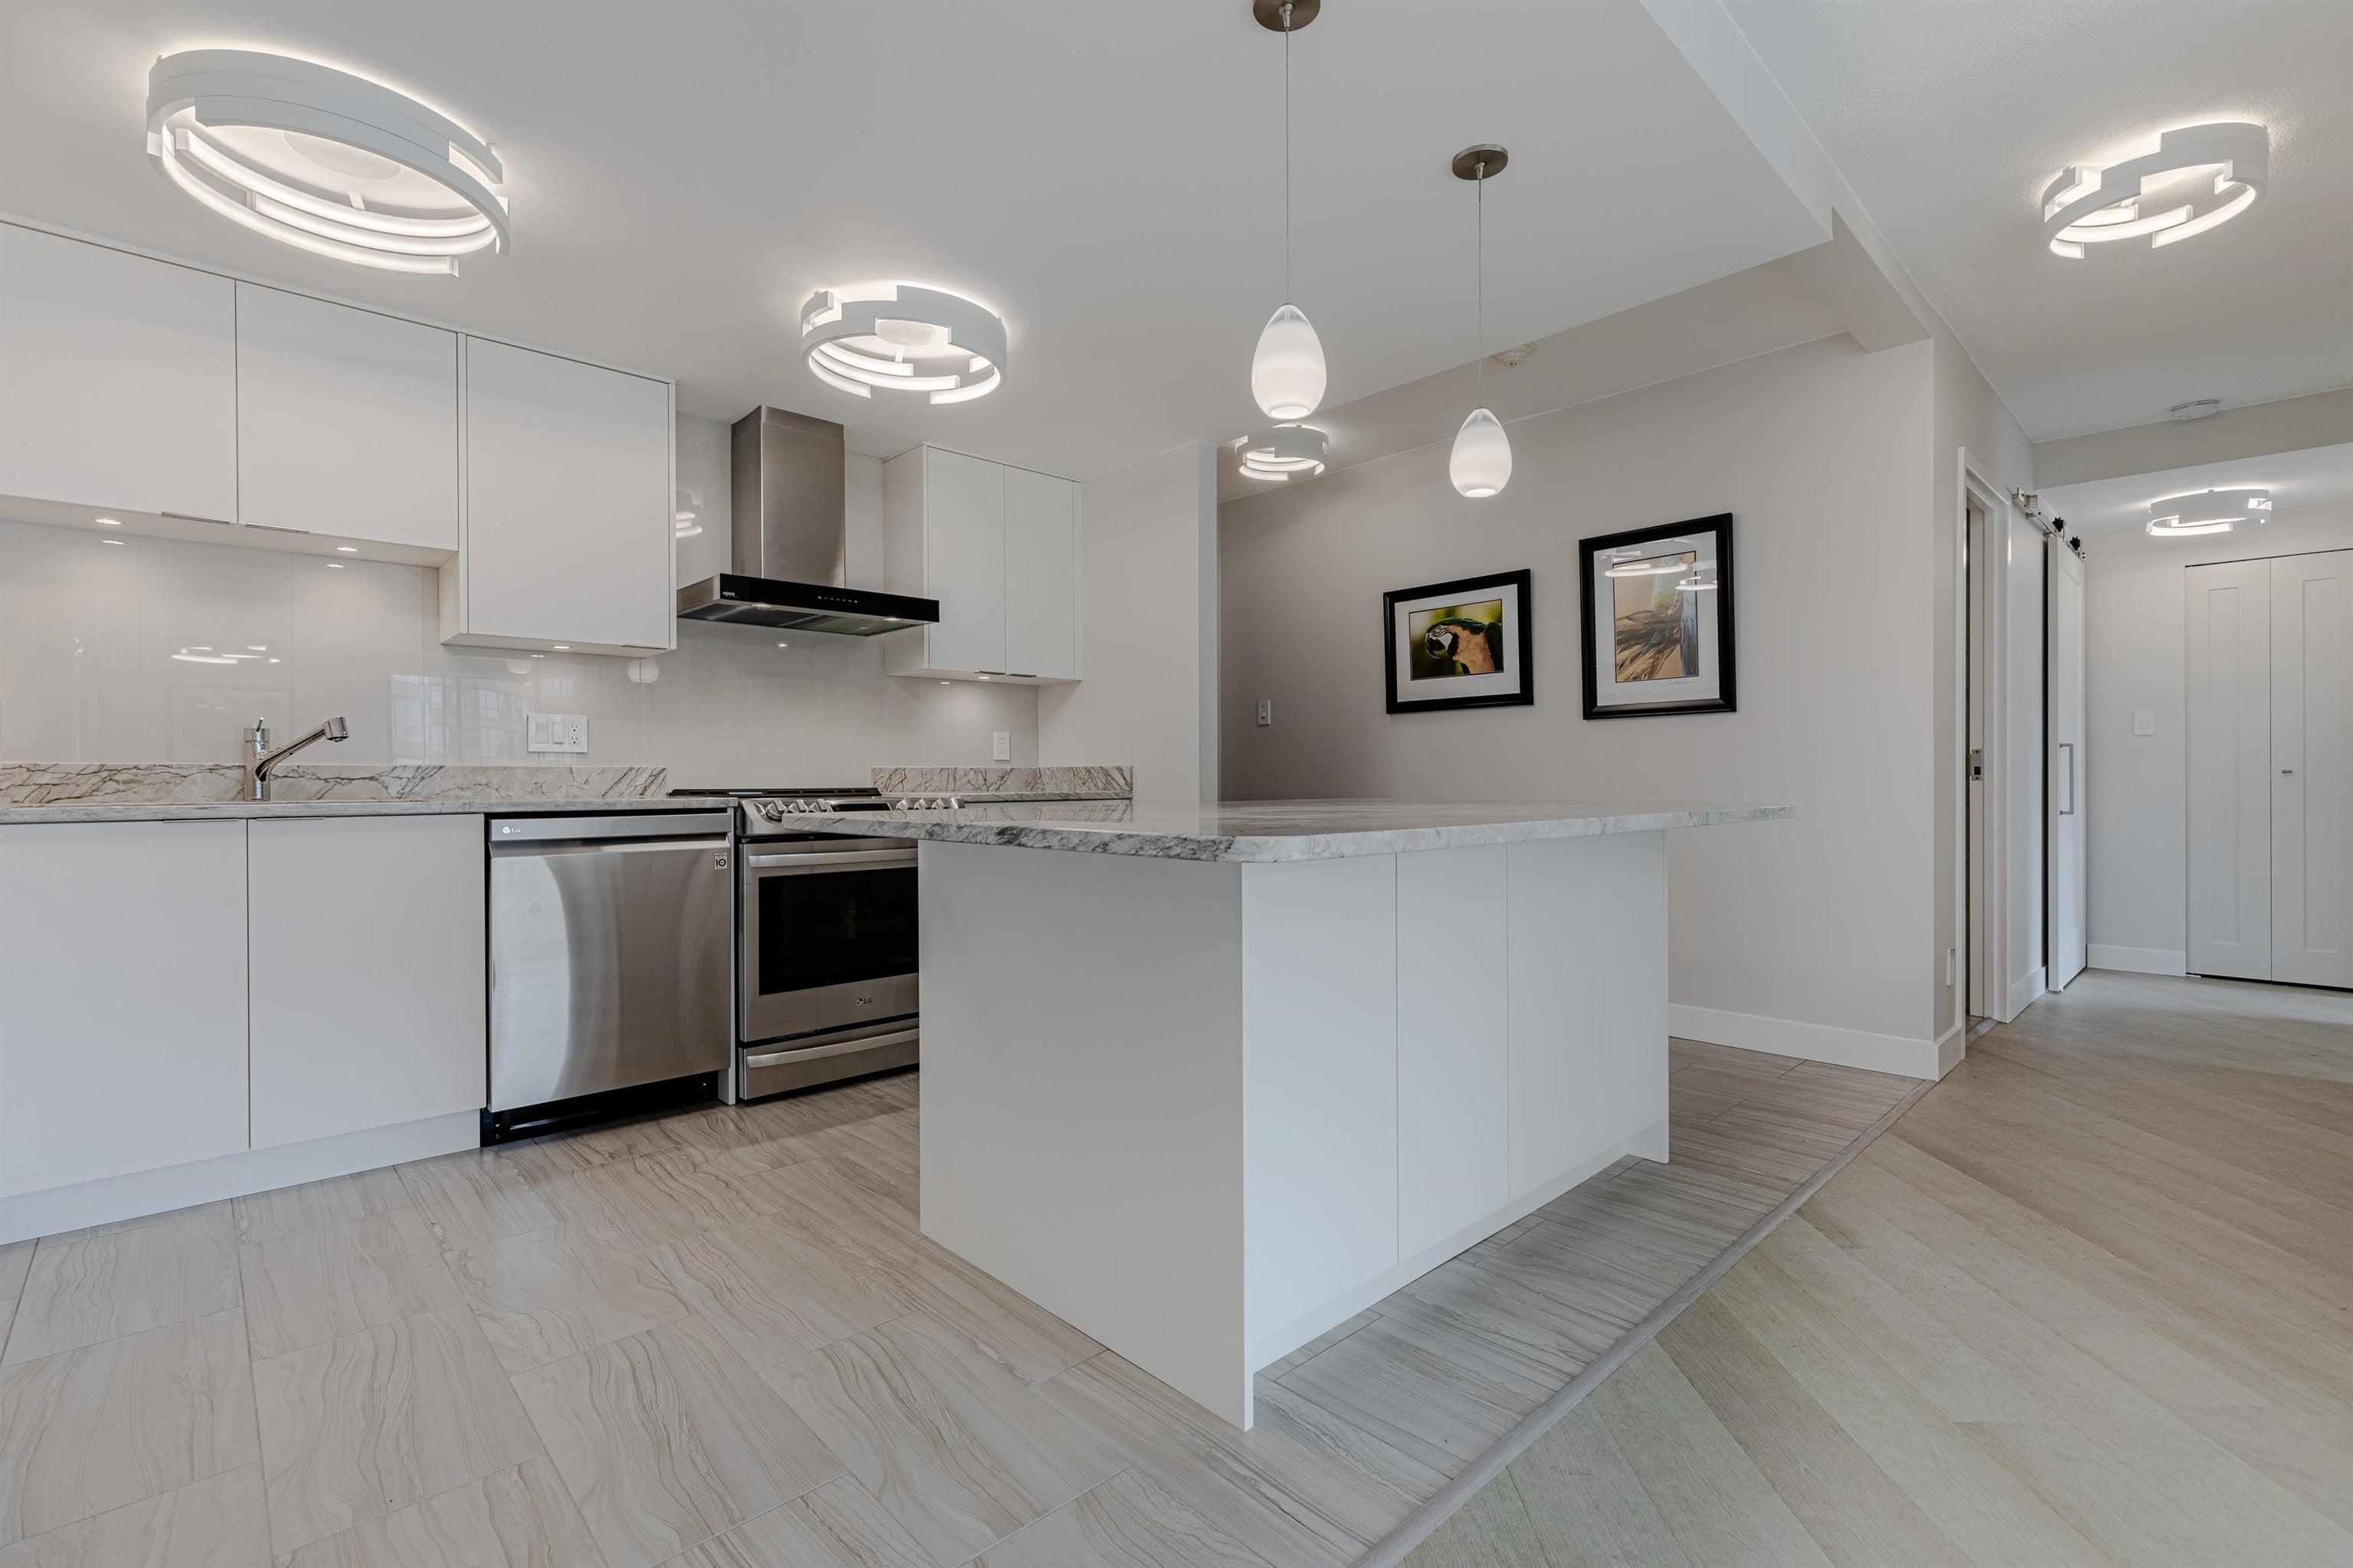 406 1450 PENNYFARTHING DRIVE - False Creek Apartment/Condo for sale, 2 Bedrooms (R2617259) - #3